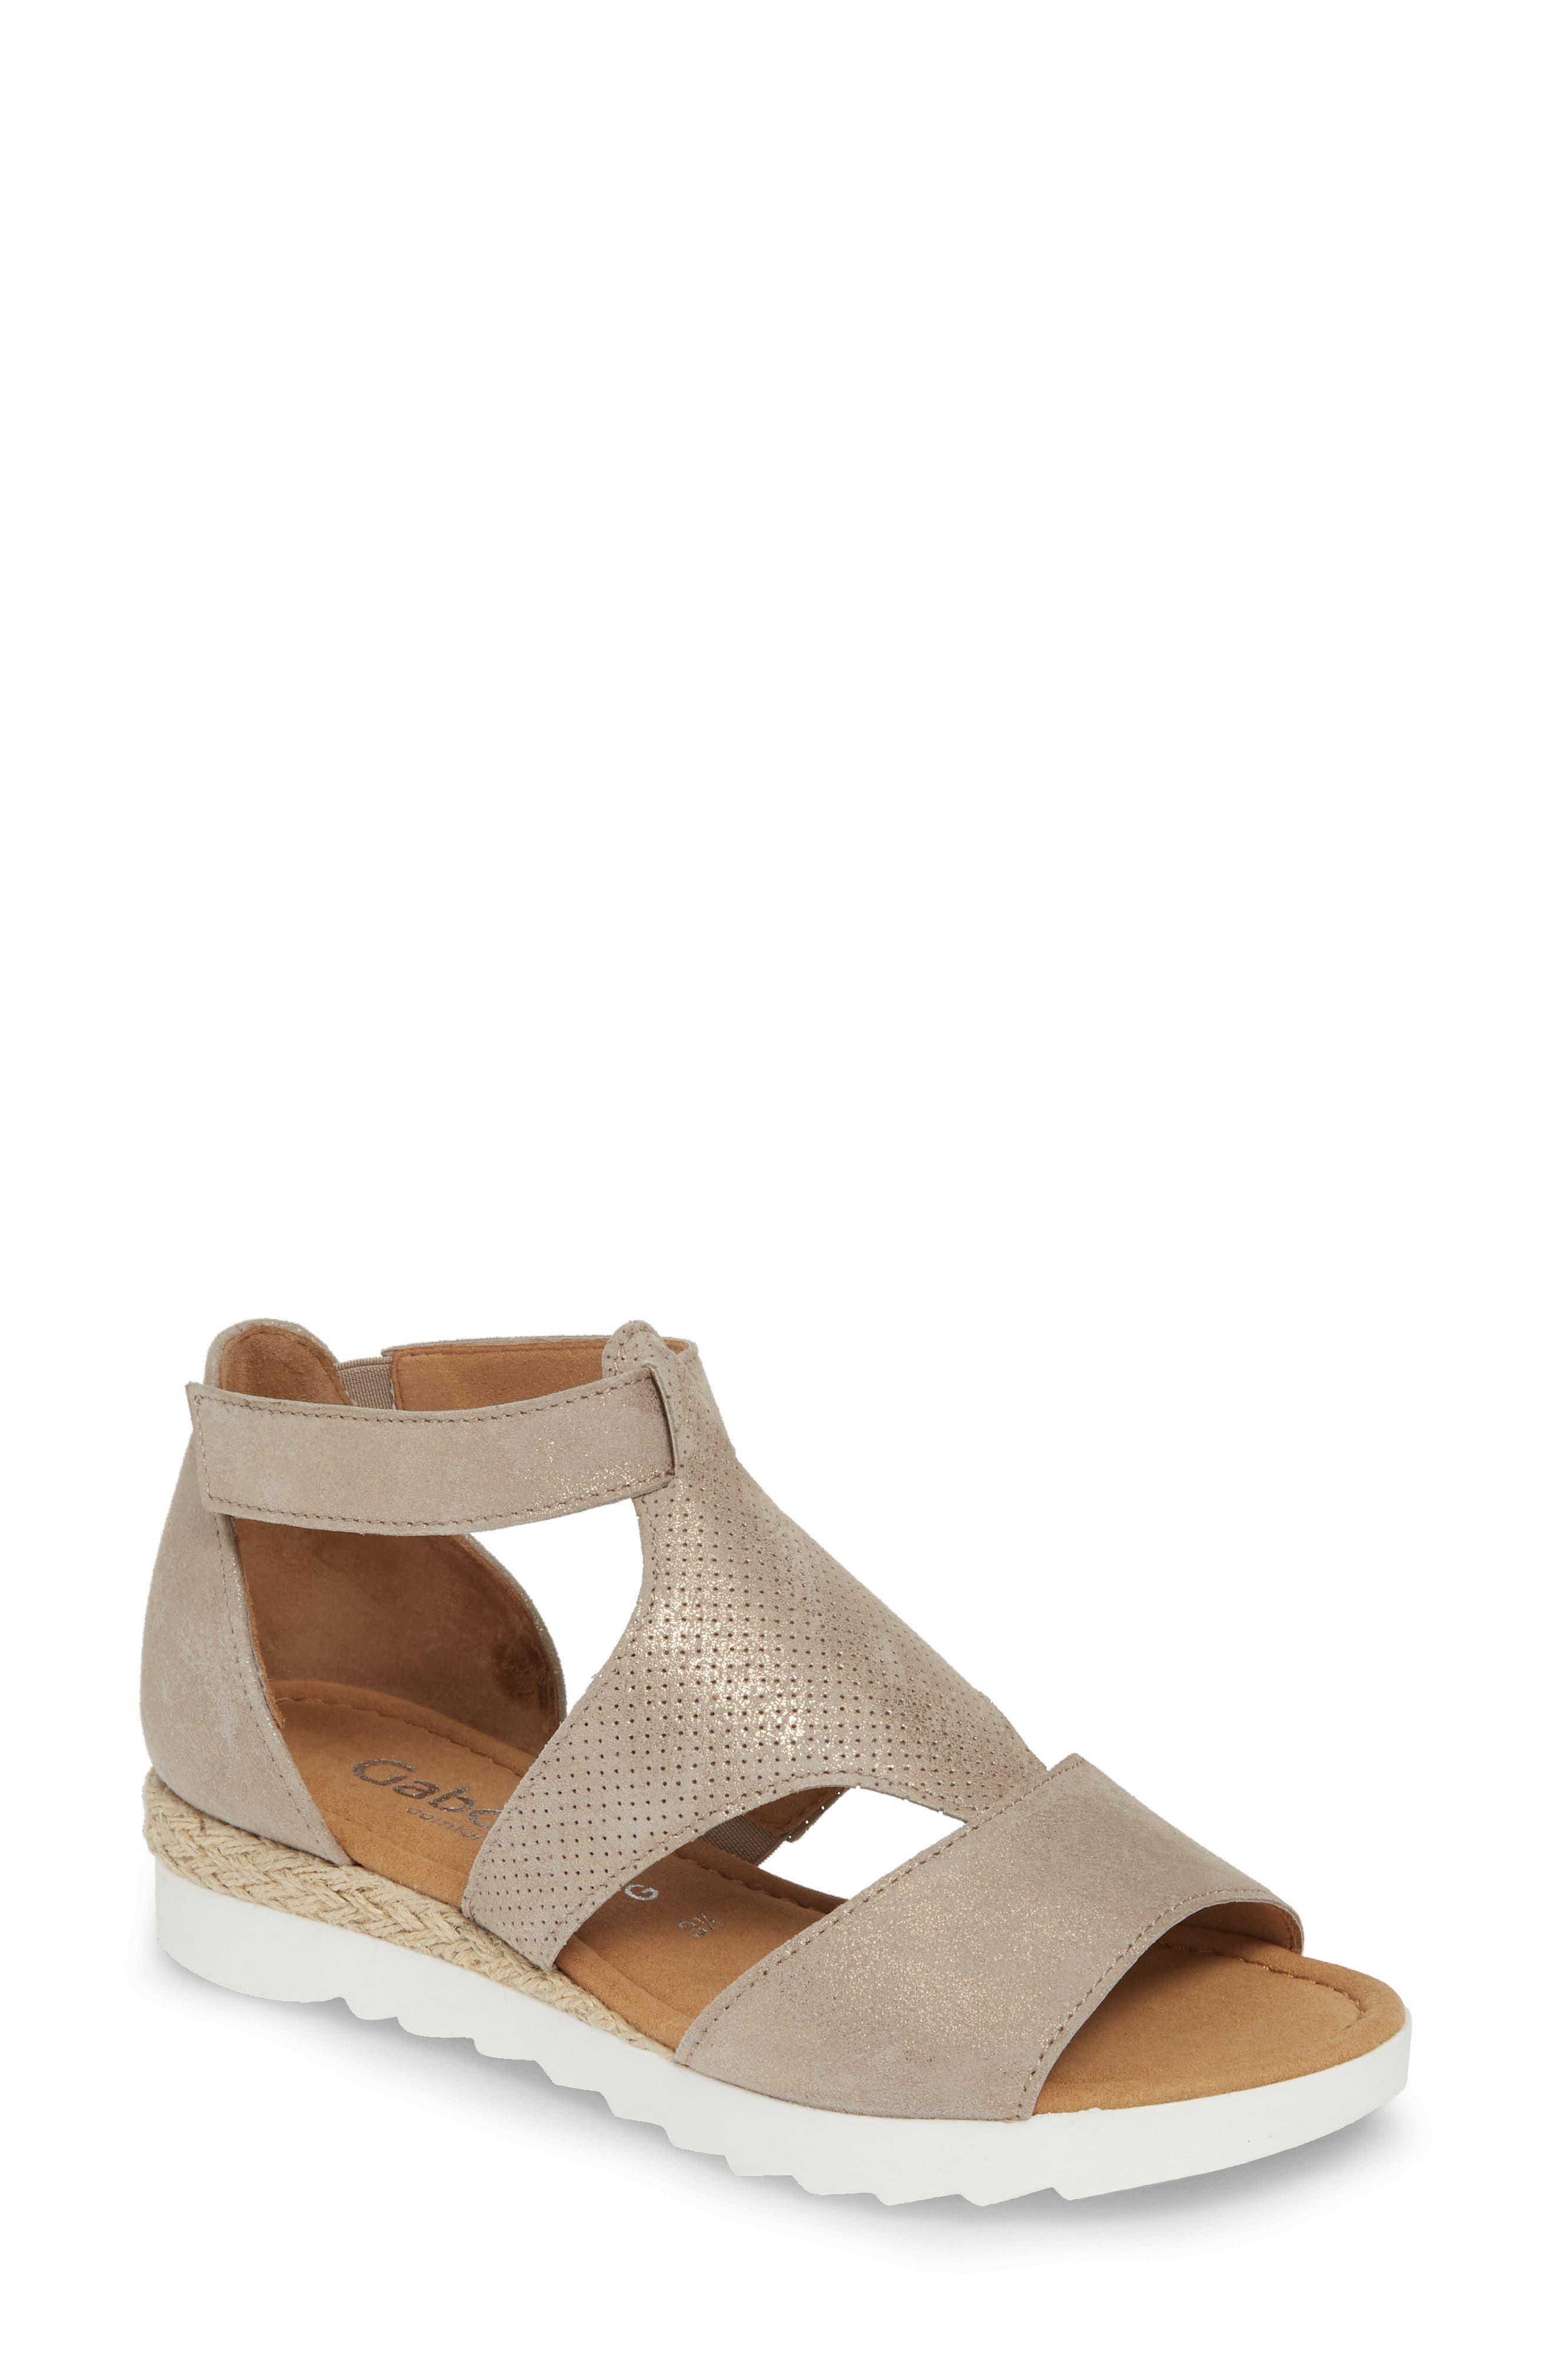 Gabor Casual Sandal (Women)